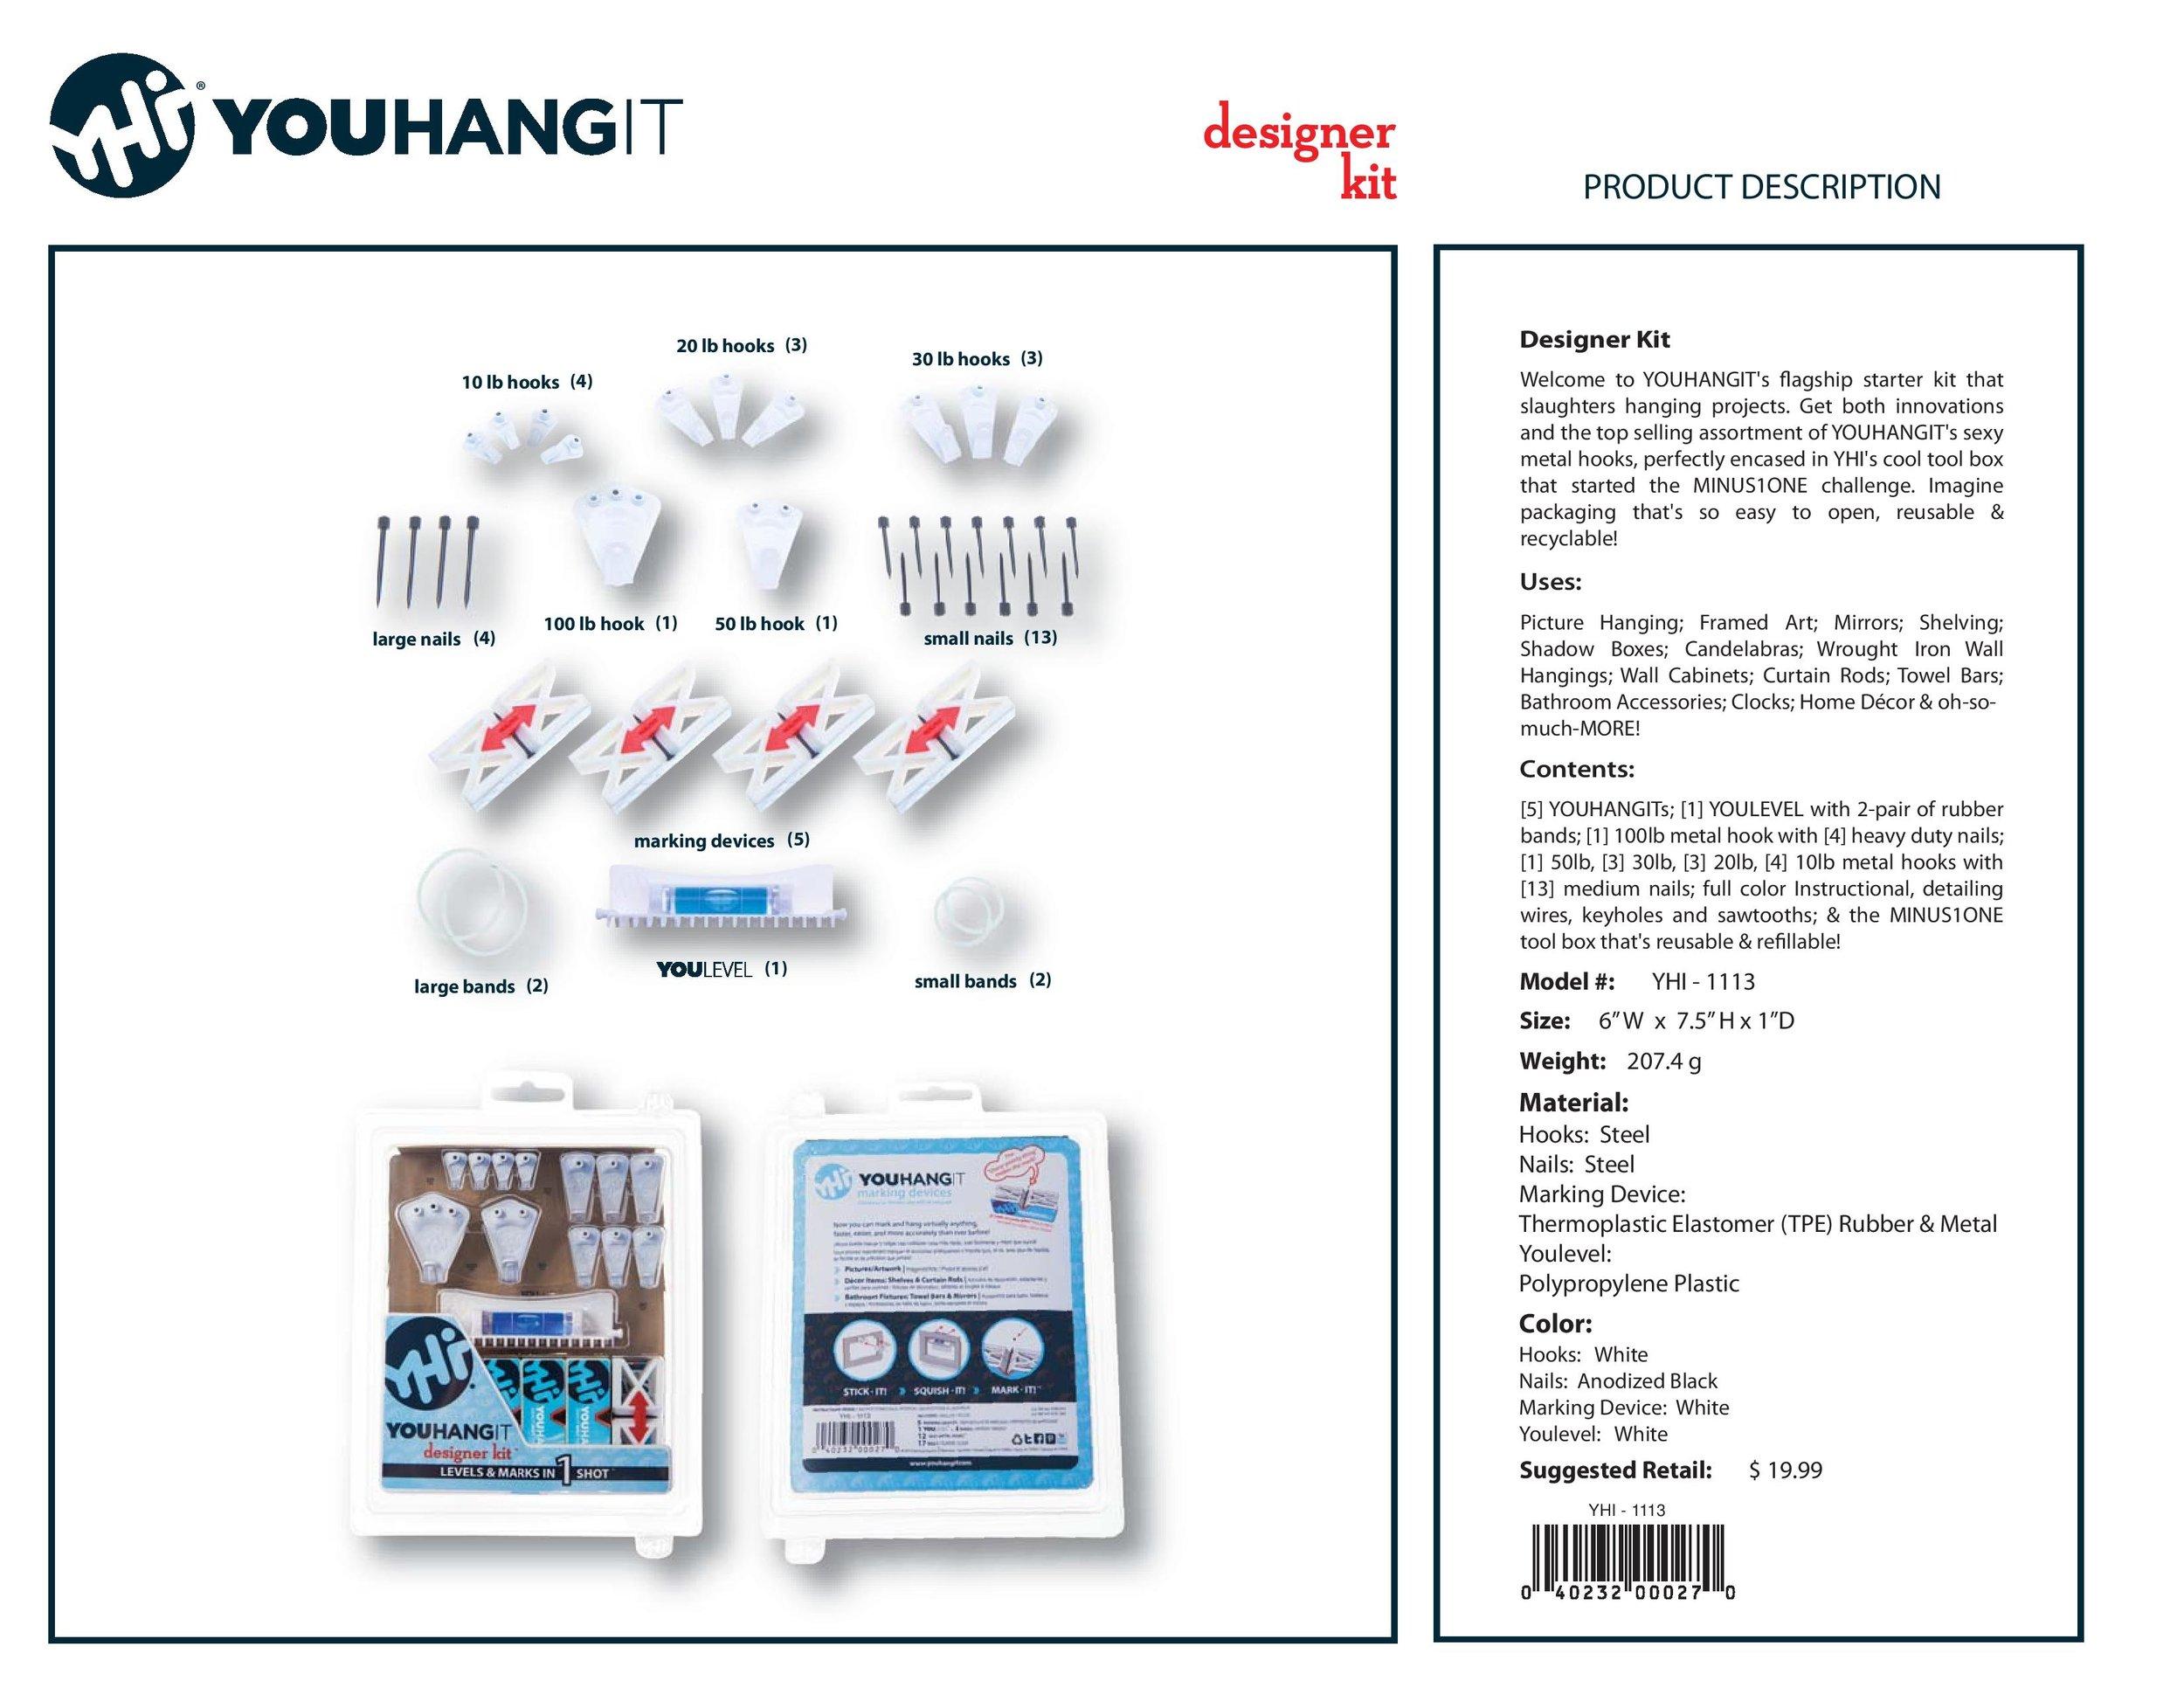 YHI-1113 - The Designer Kit Series Trading Card.jpg